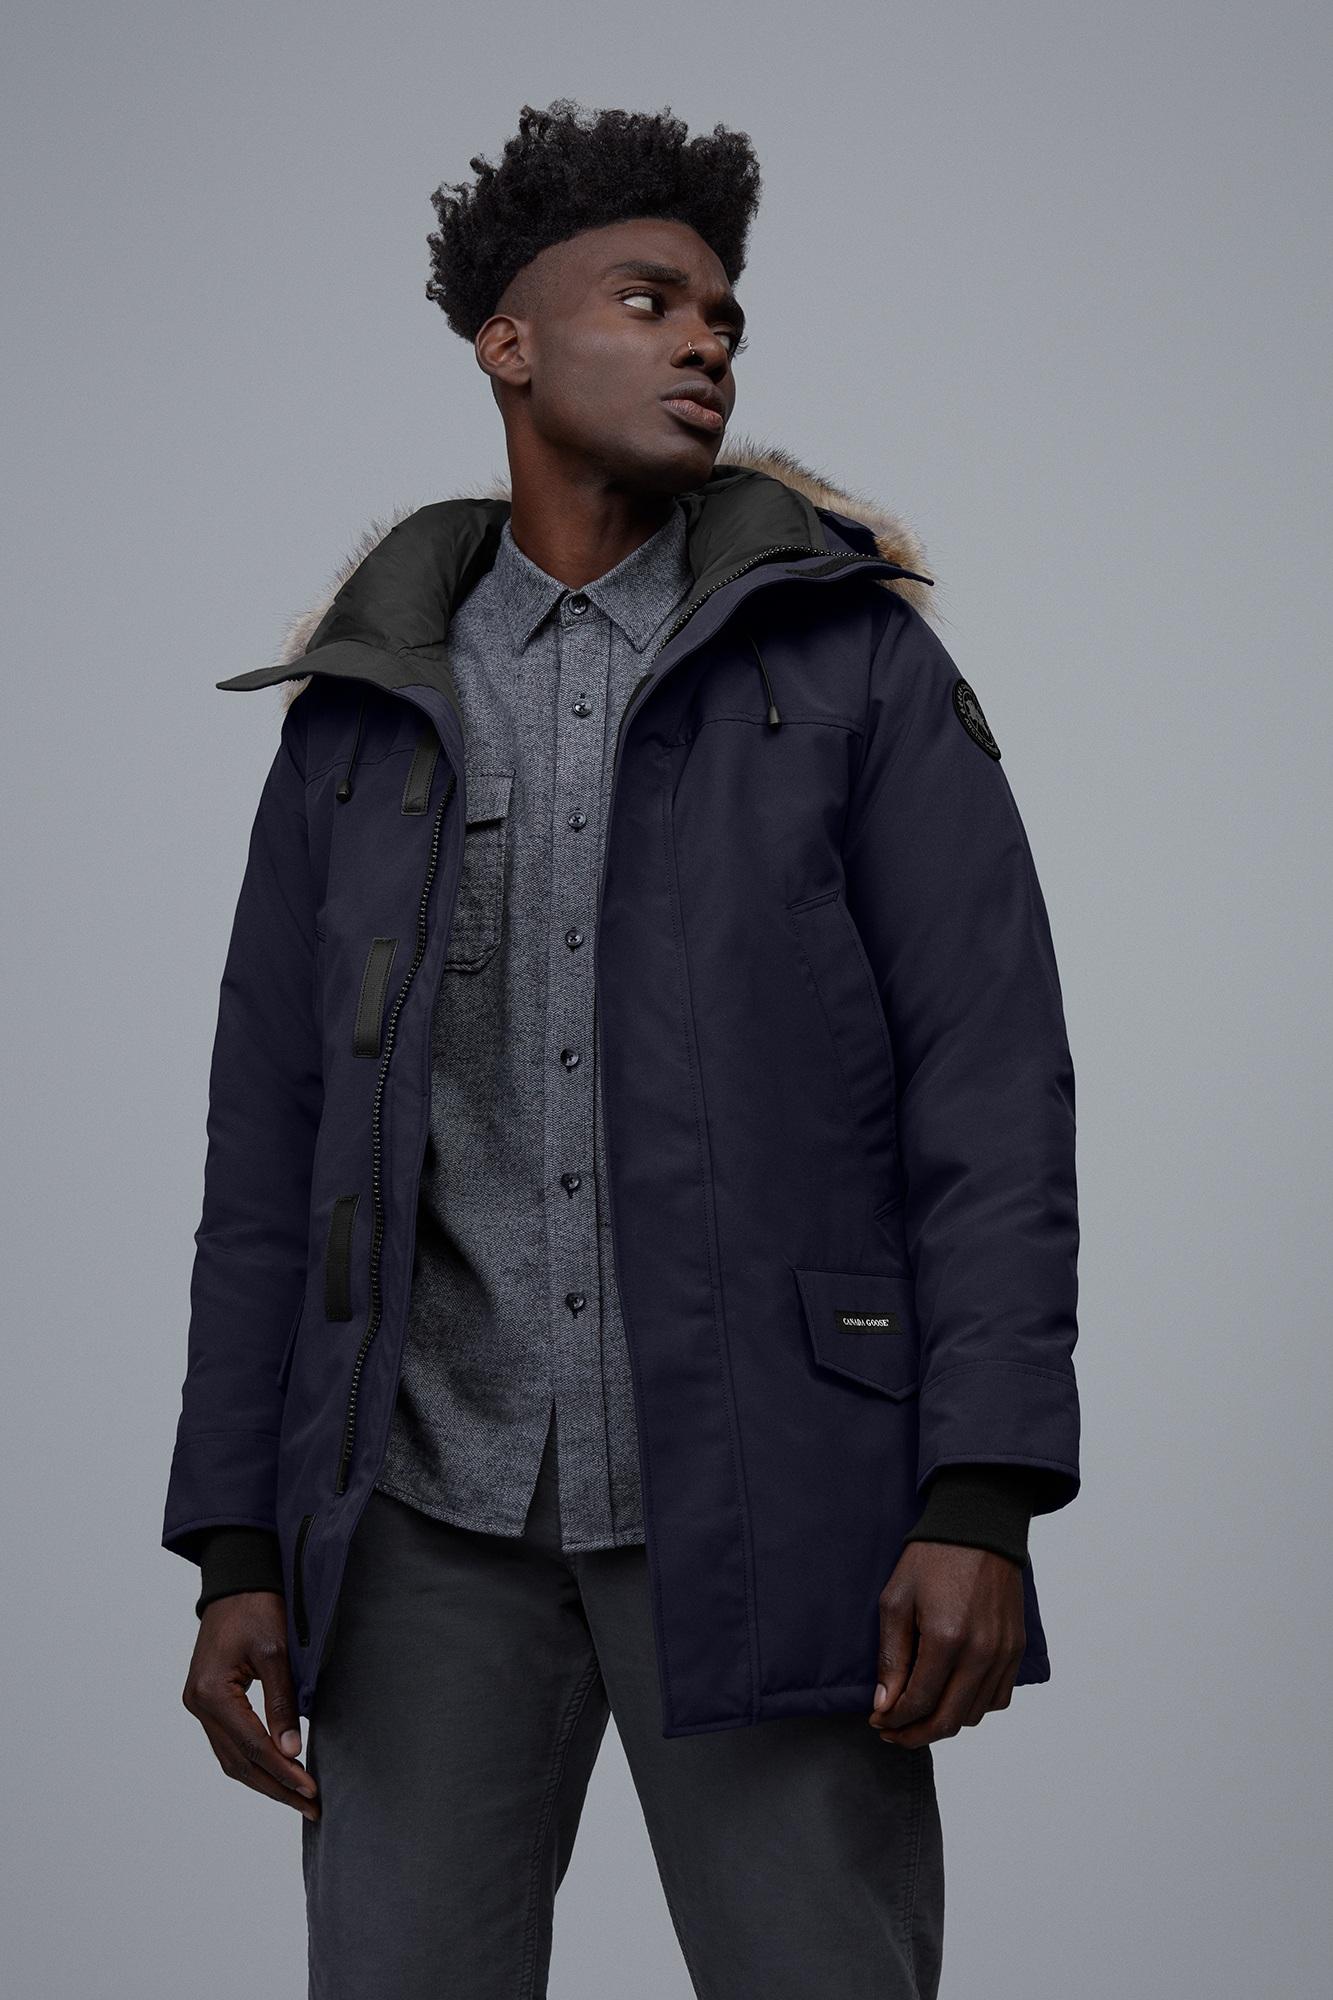 NEW CANADA GOOSE Langford ParkaJacket Black Men's Small Fur Trim